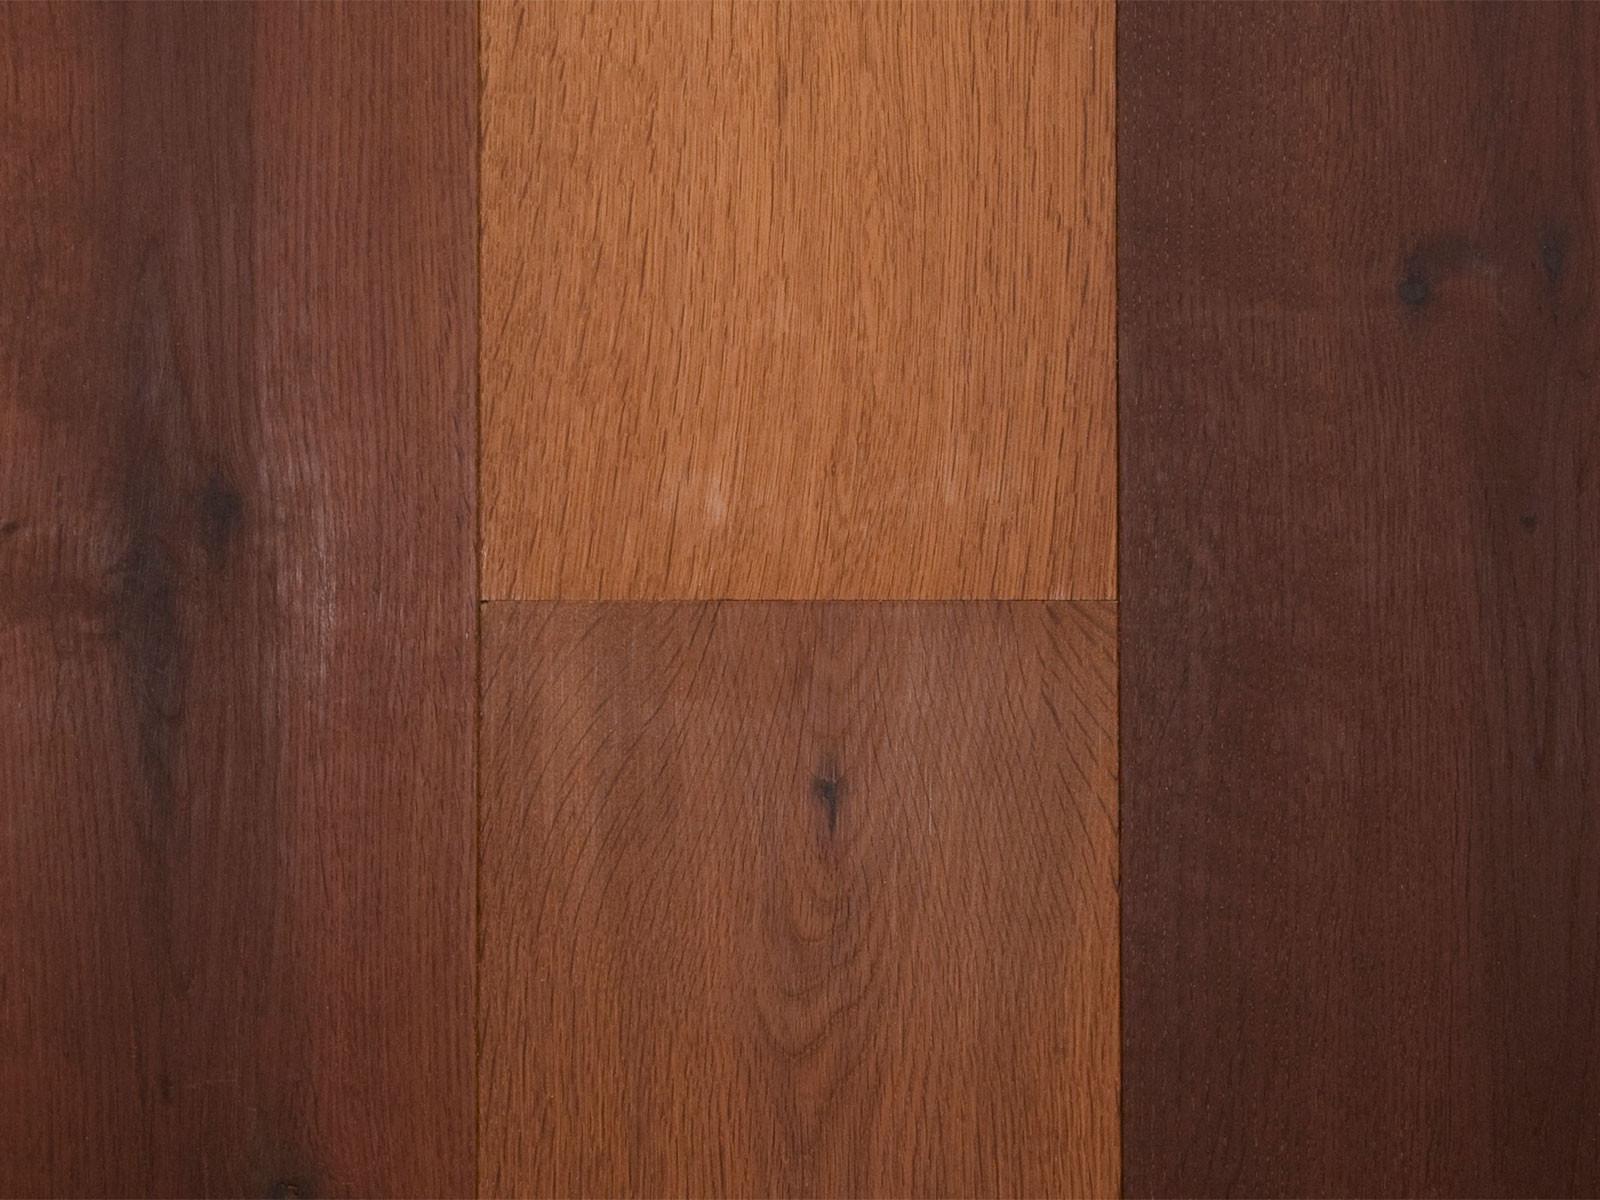 bruce hickory hardwood flooring reviews of duchateau hardwood flooring houston tx discount engineered wood within savoy european oak